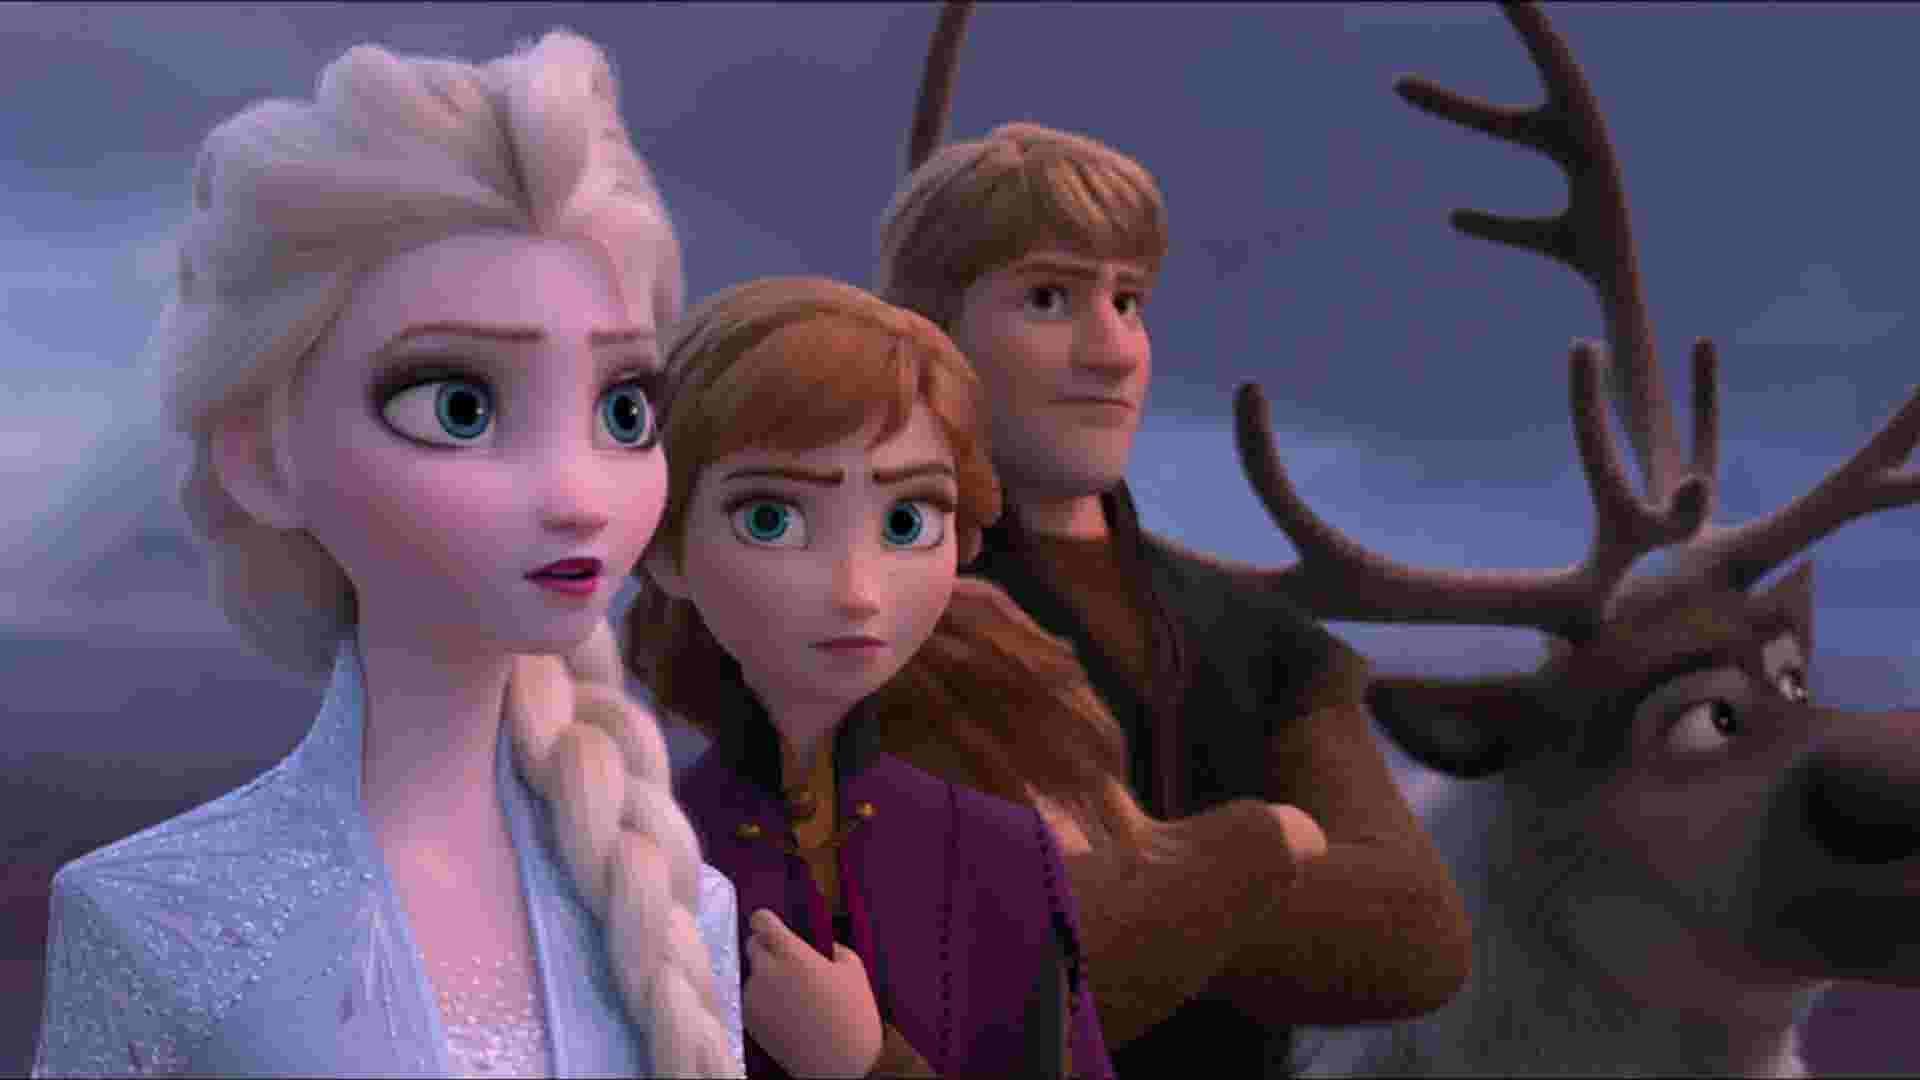 Disney Frozen 2 Trailer Has Anna Elsa And Fierce New Outfits